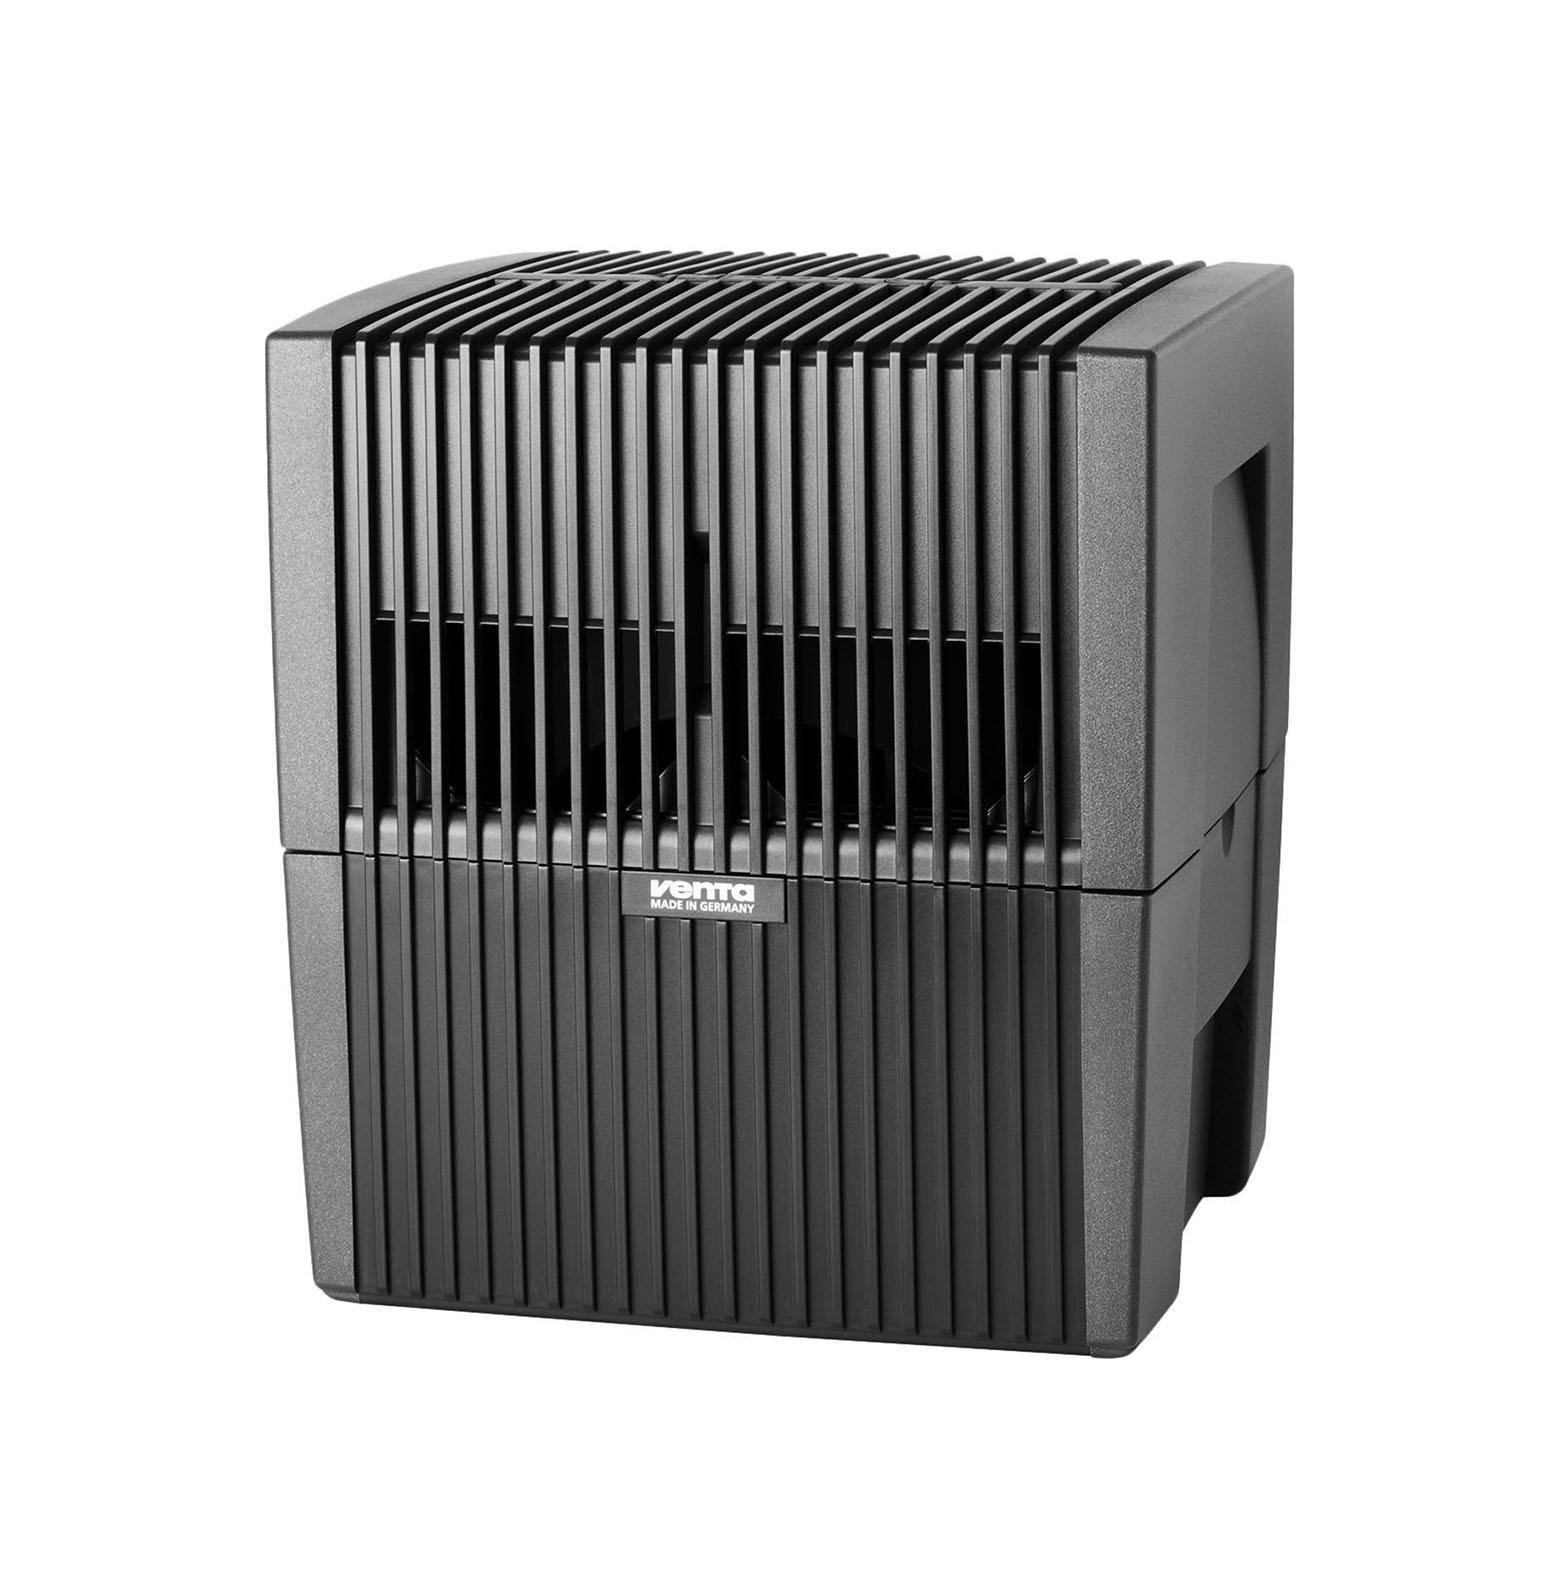 Venta LW 25, Black мойка воздуха очиститель воздуха venta lw 15 white